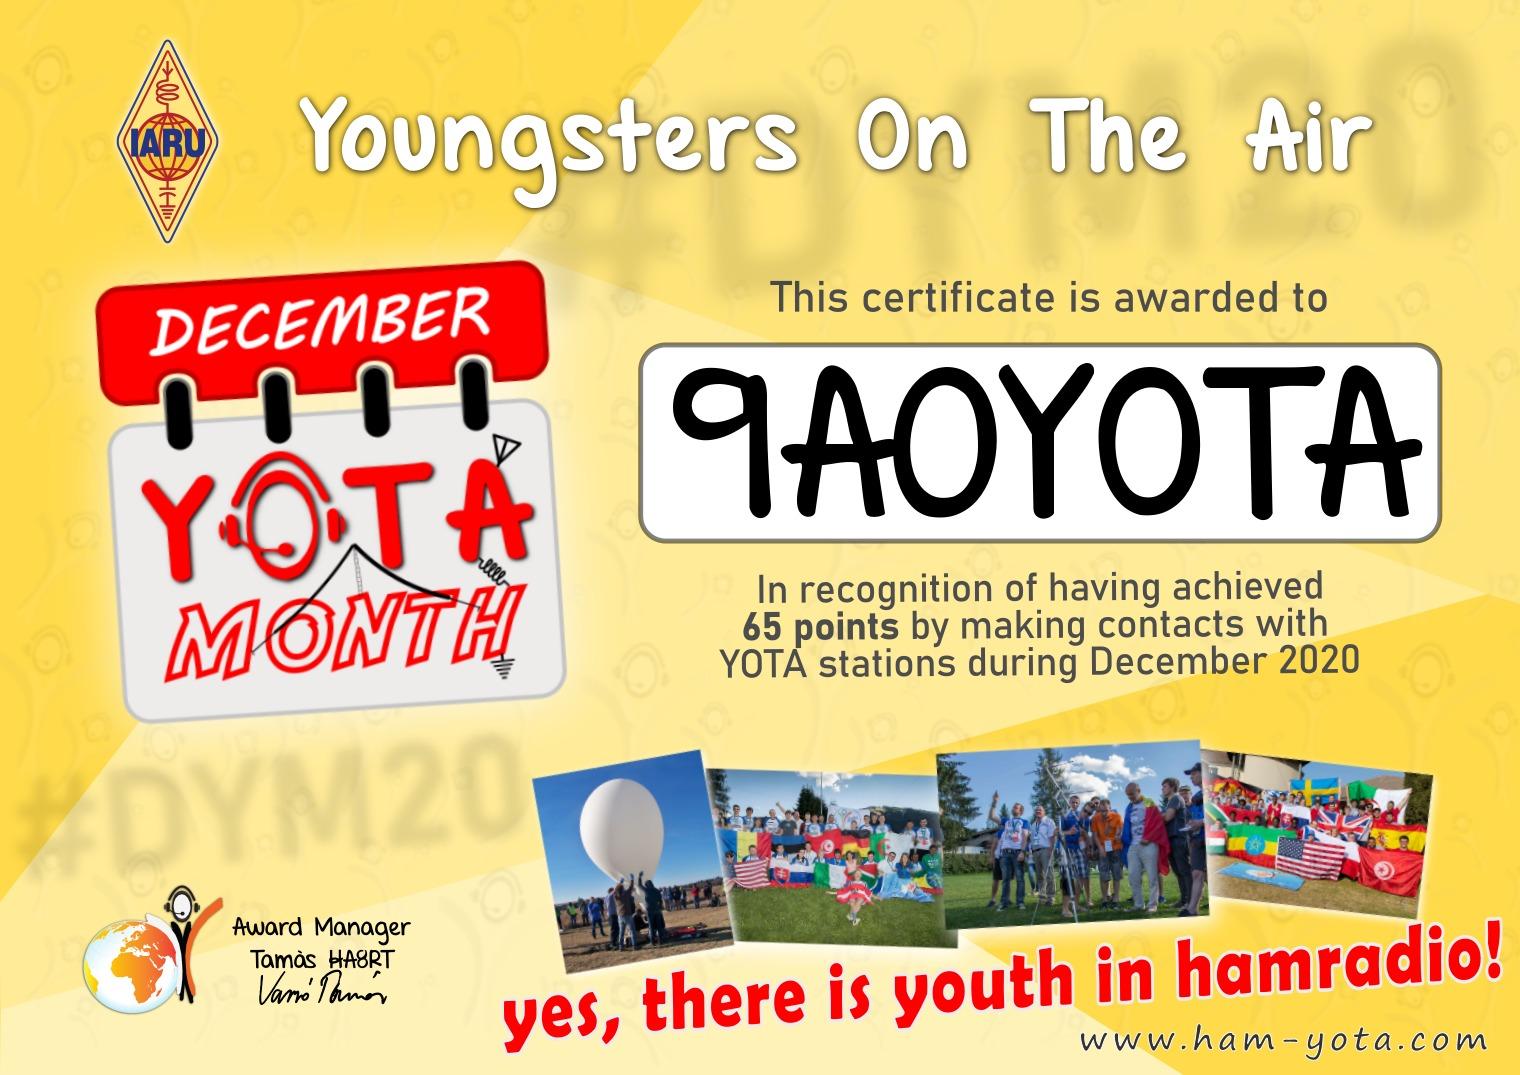 yota award 3